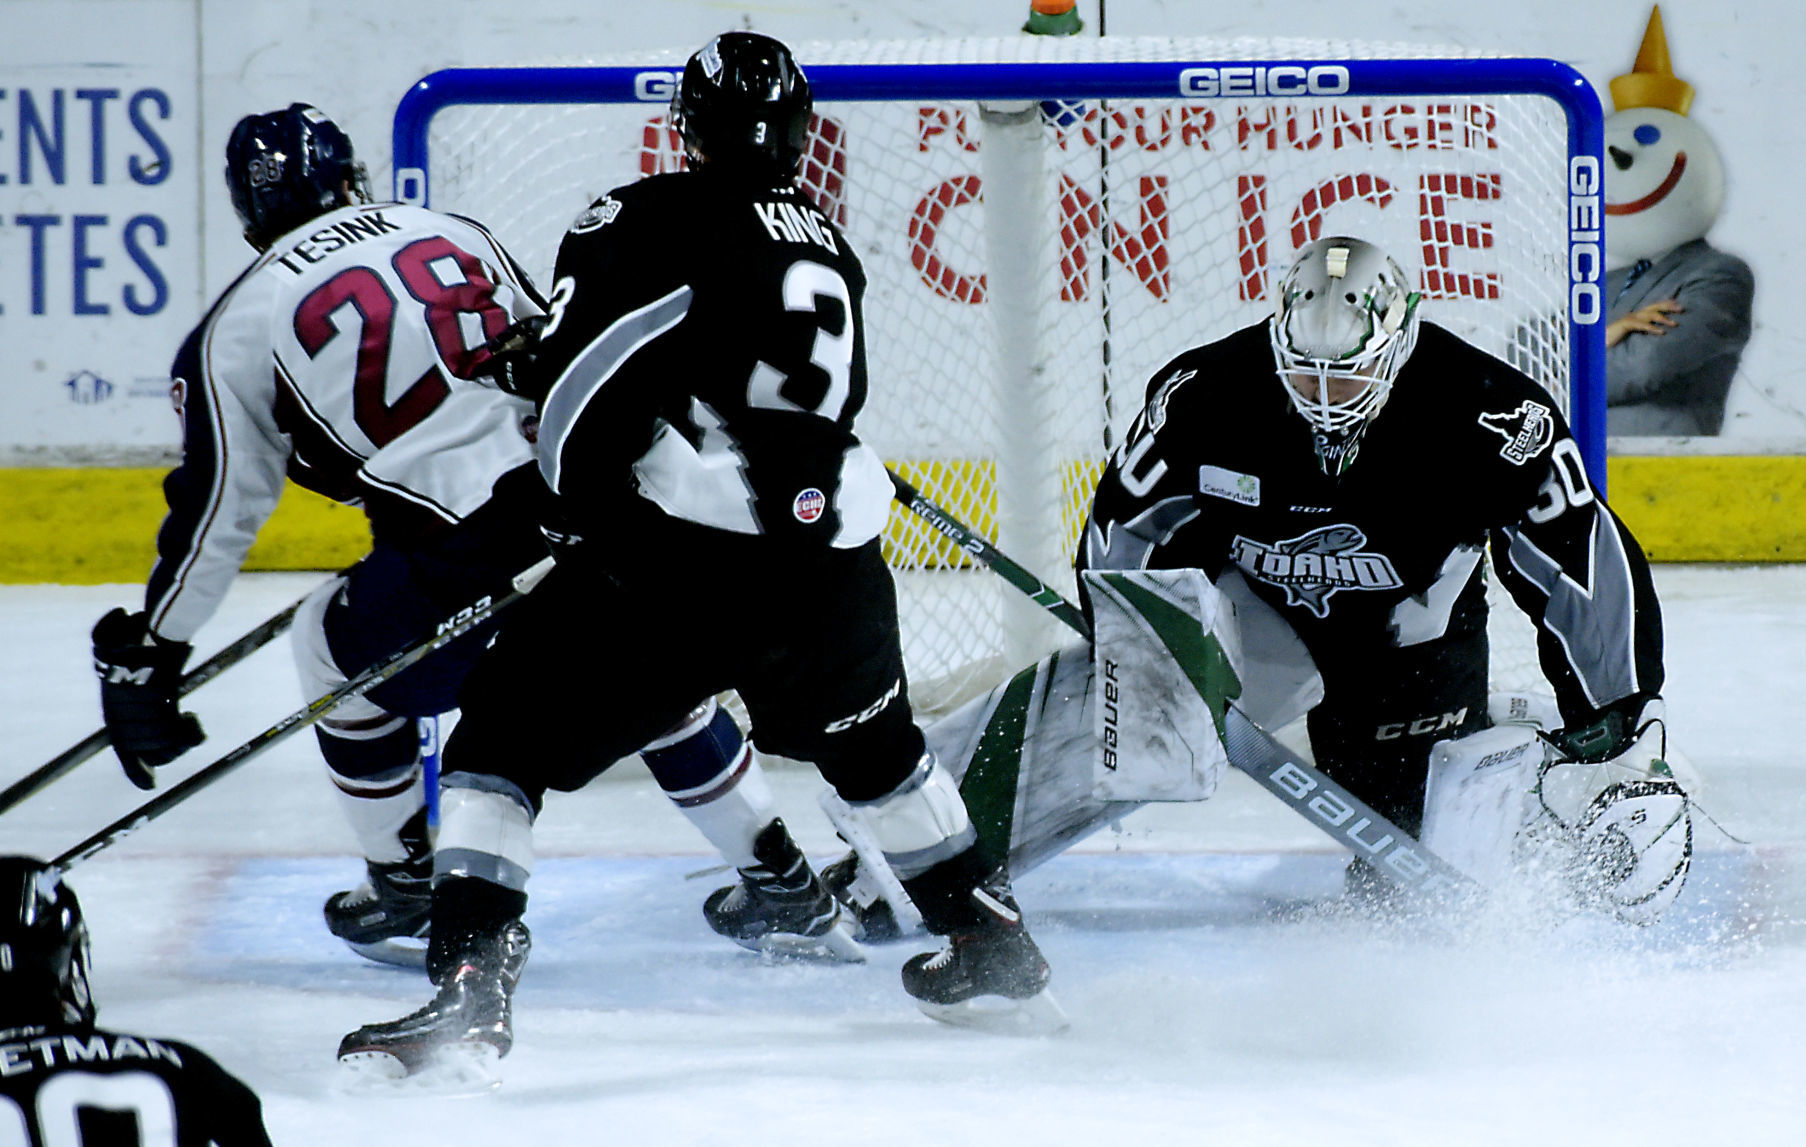 ECHL: Goalkeeper Point Lifts Steelheads In Debut